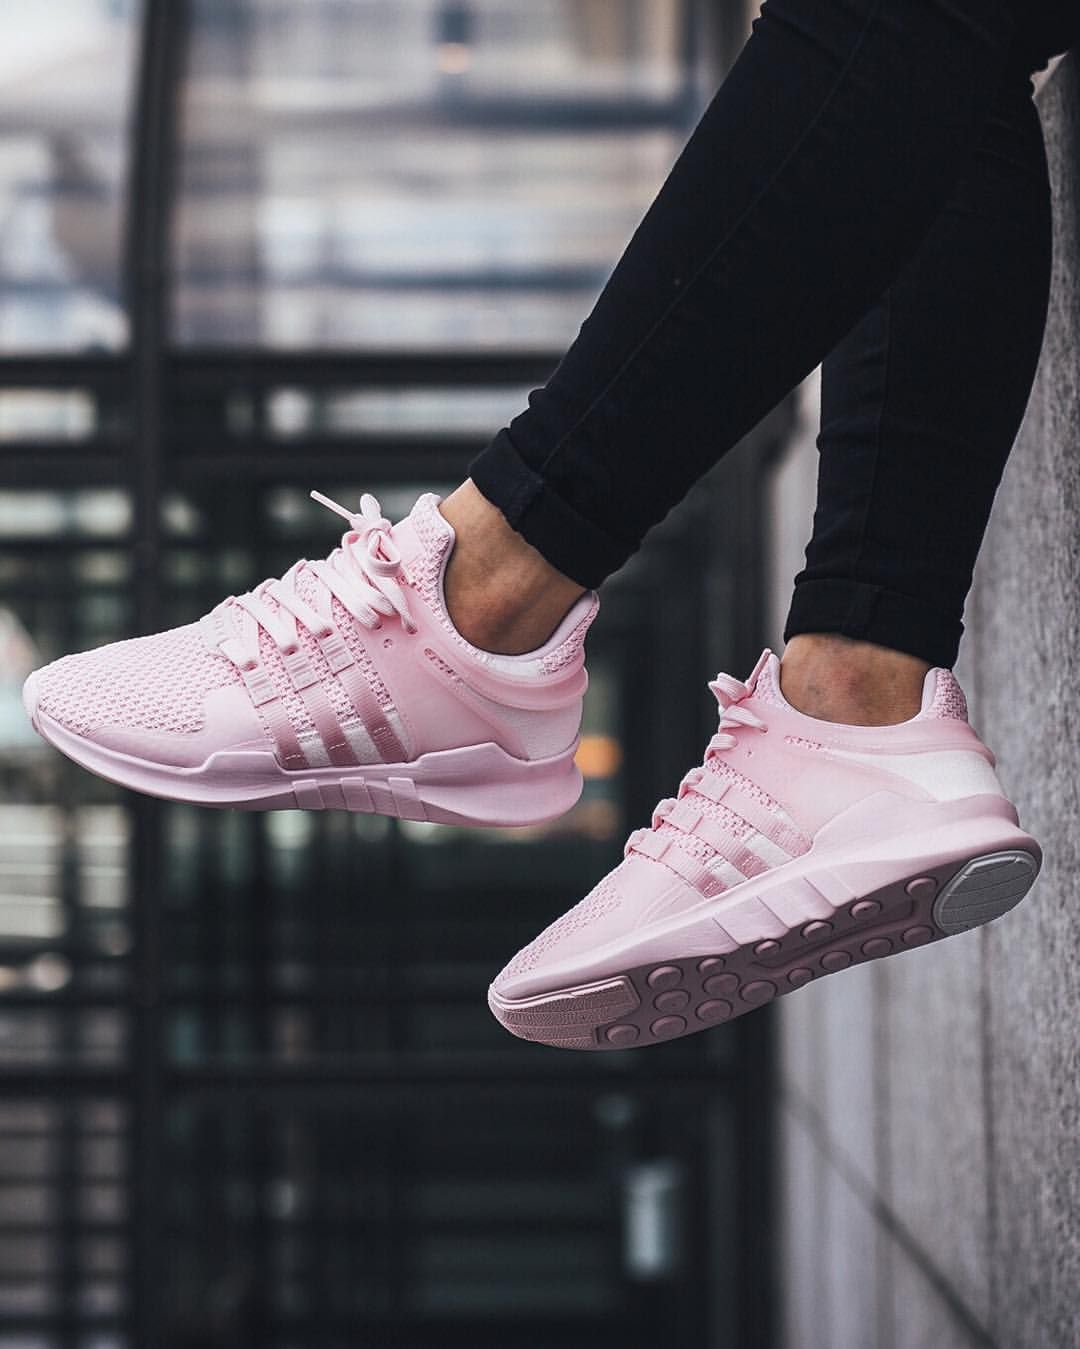 Consulta Esta Foto De Instagram De Titoloshop 6 765 Me Gusta Pink Adidas Adidas Eqt Sneakers